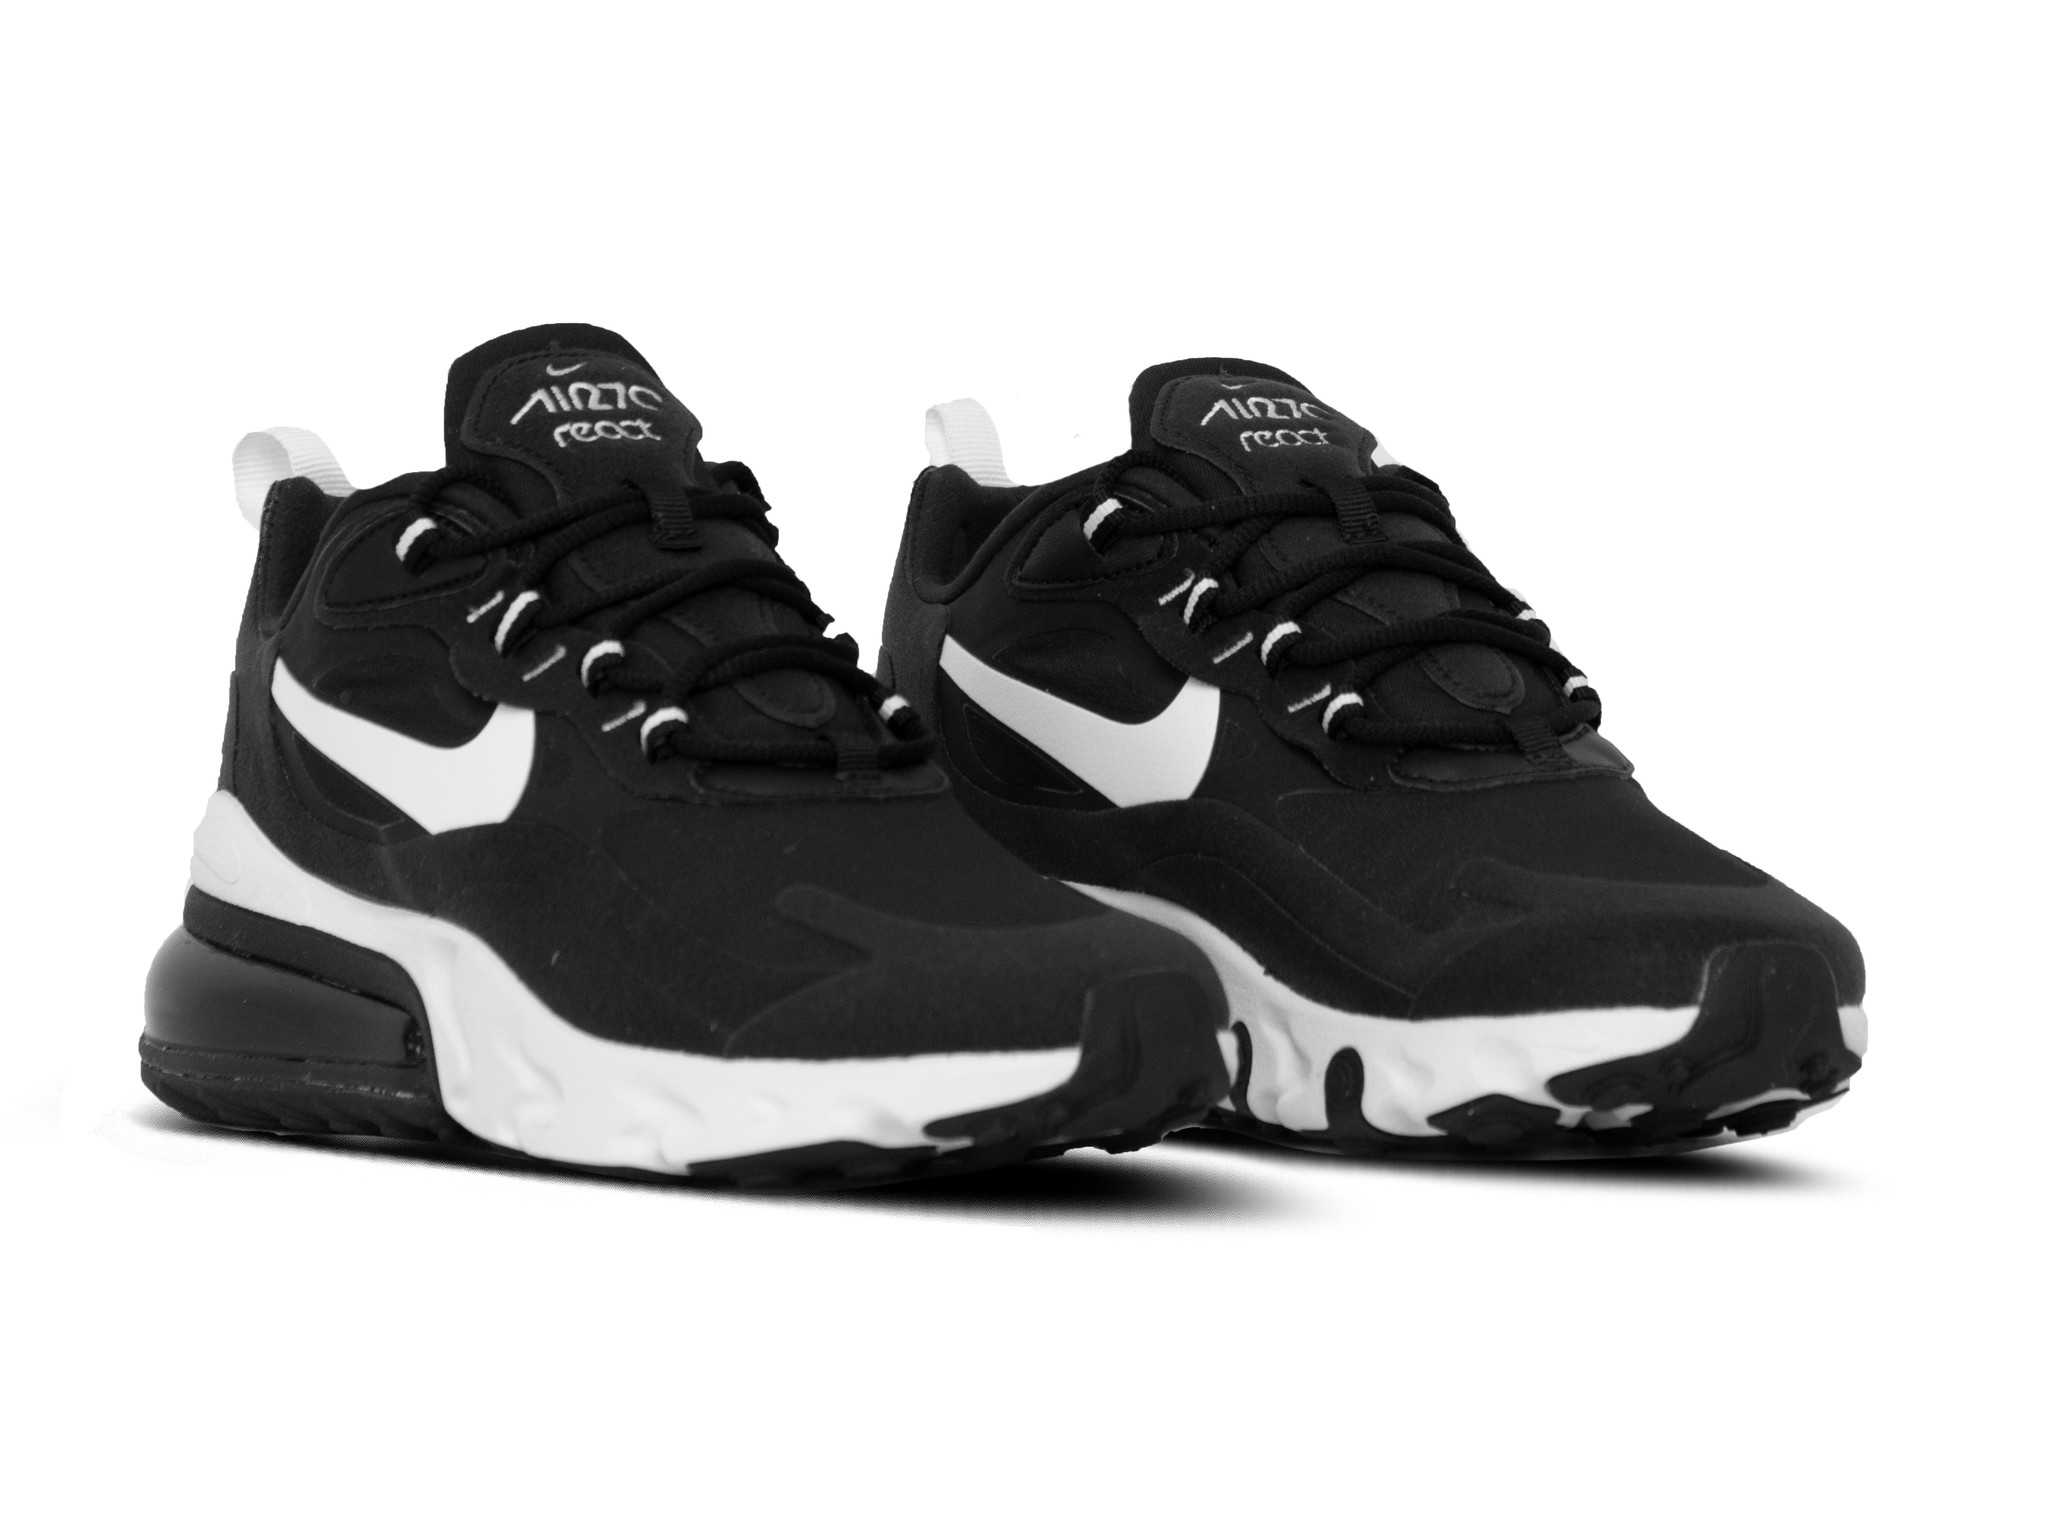 Nike Air Max 270 React Black White Black AO4971 004